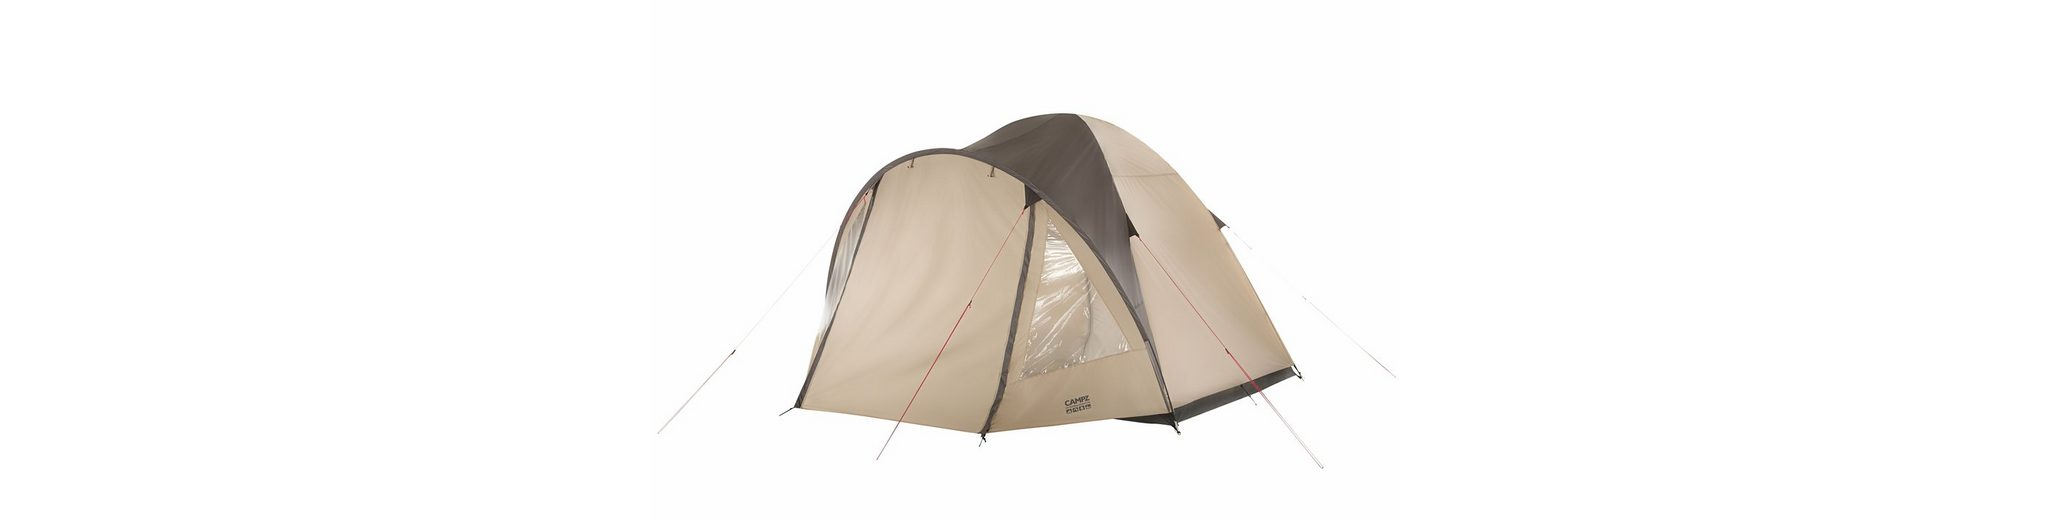 CAMPZ Zelt »Monta Zelt 4P«